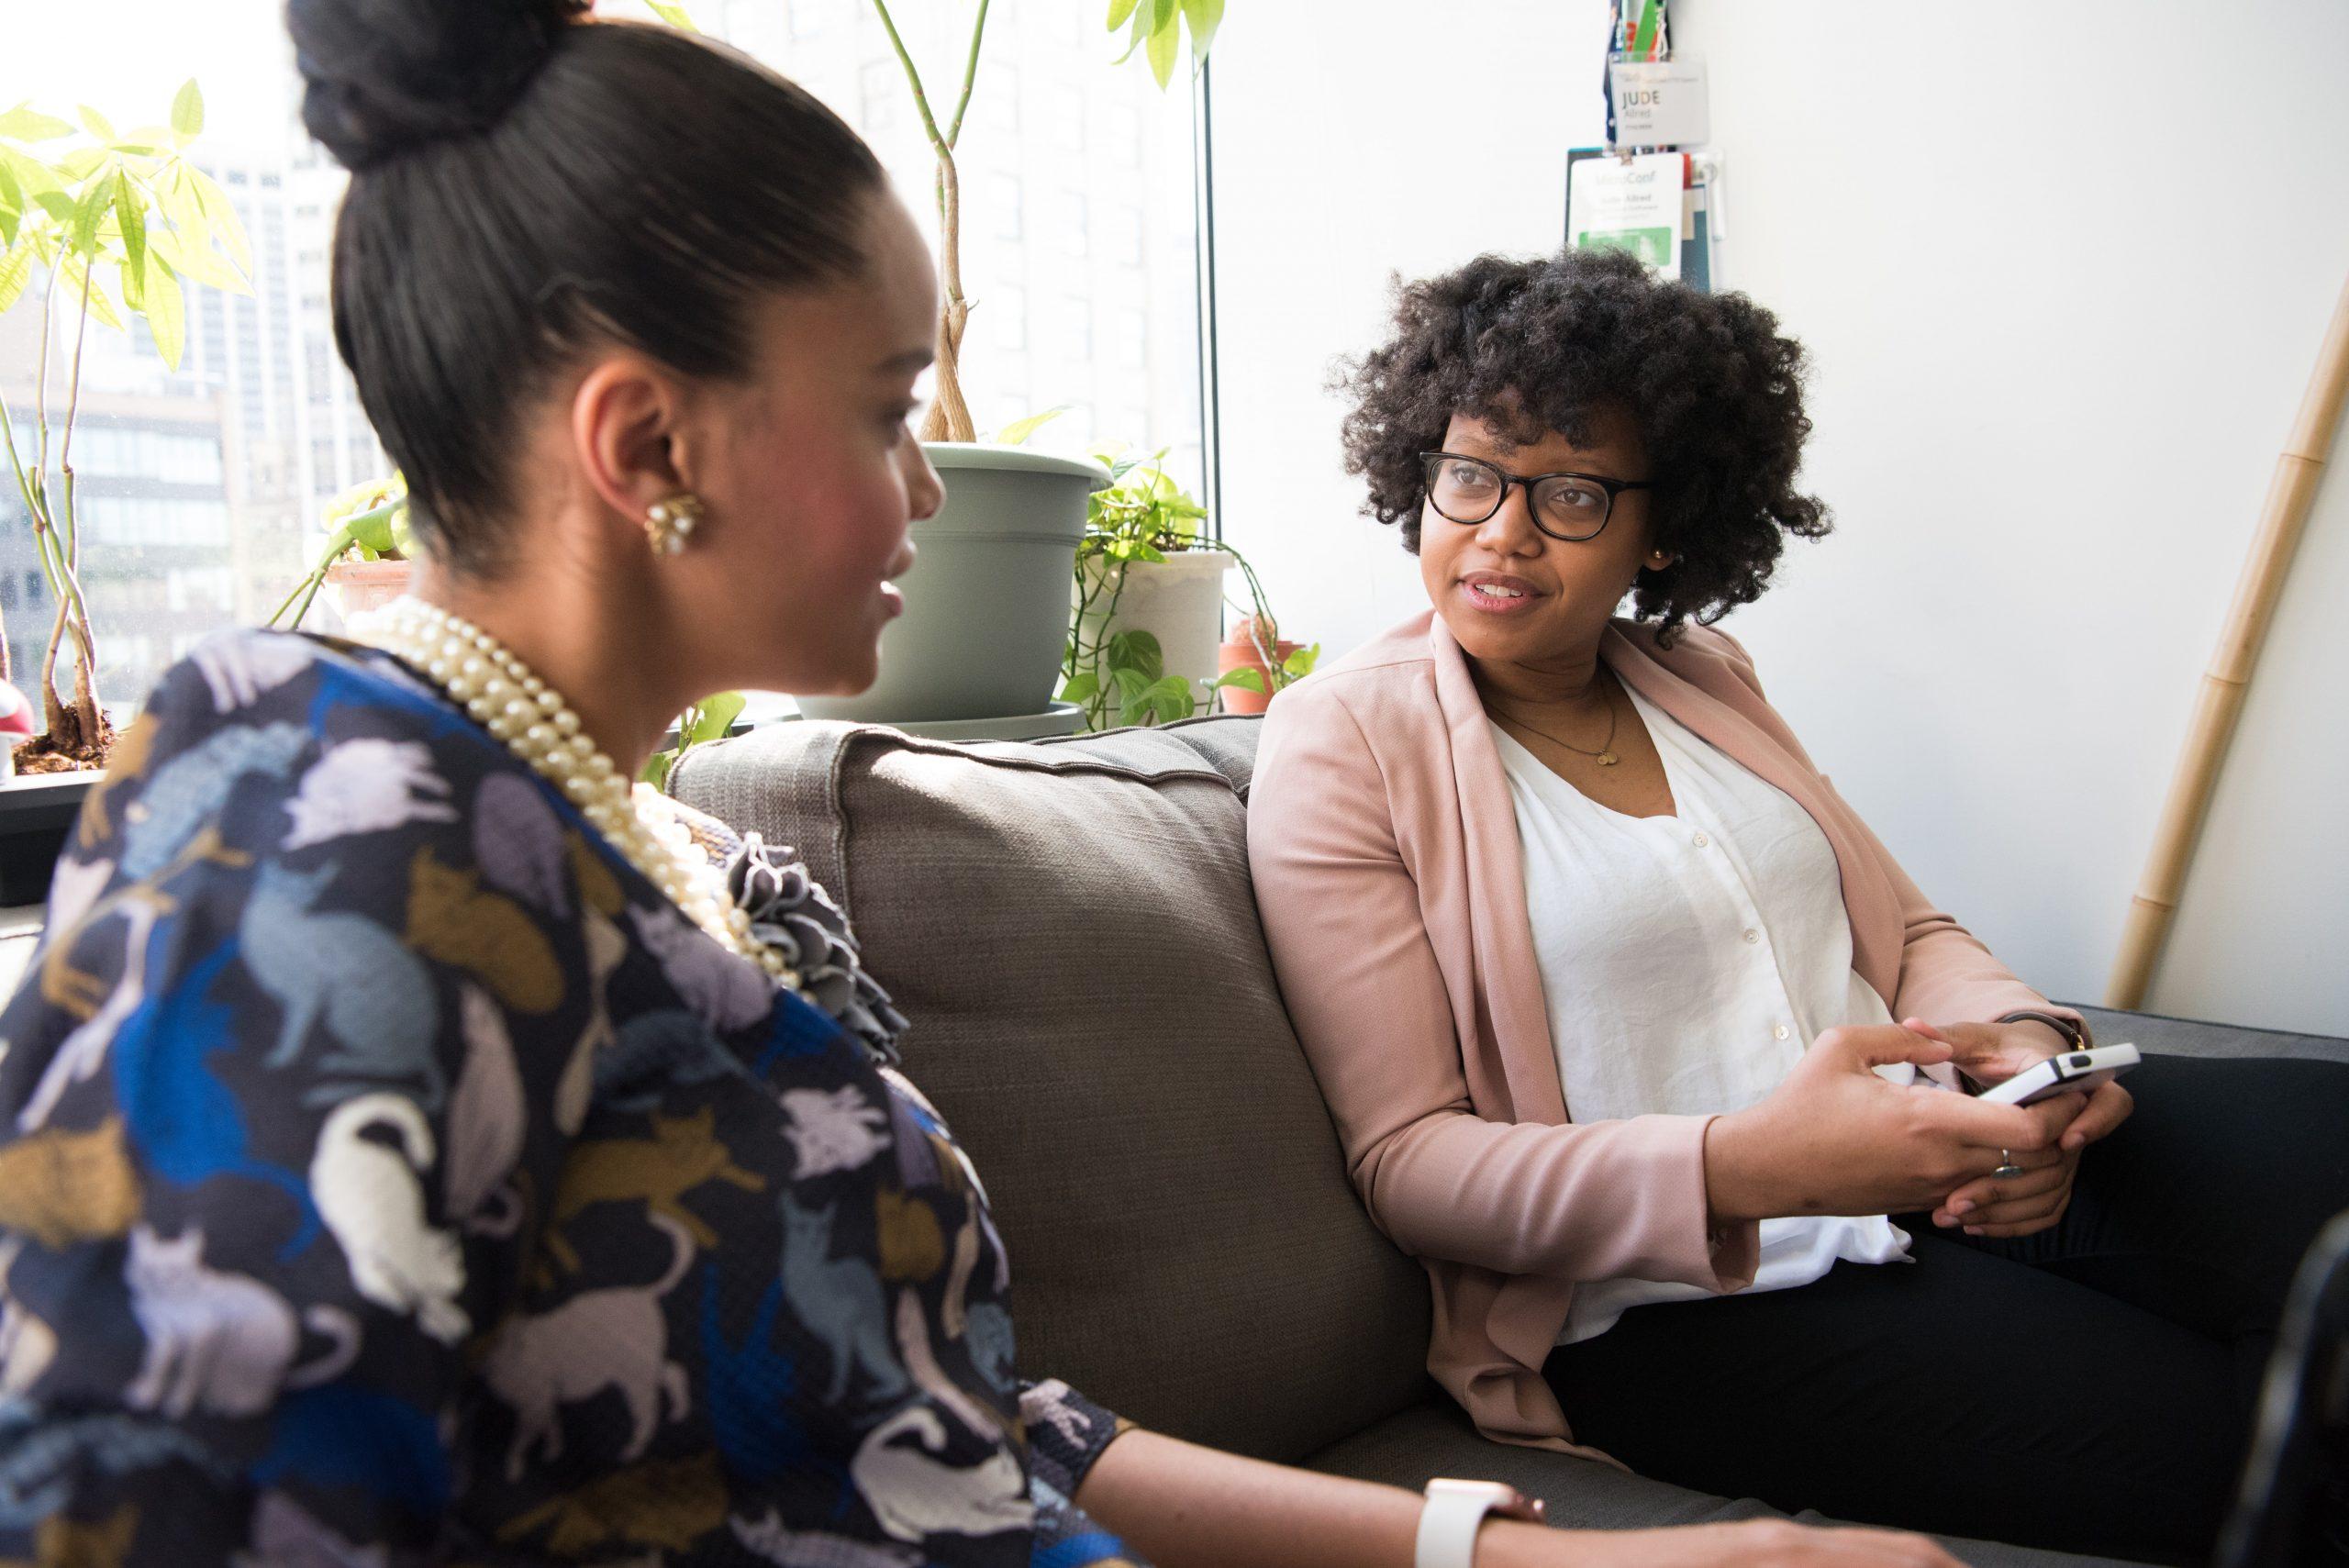 Diverse marketing team discussing difficult topics